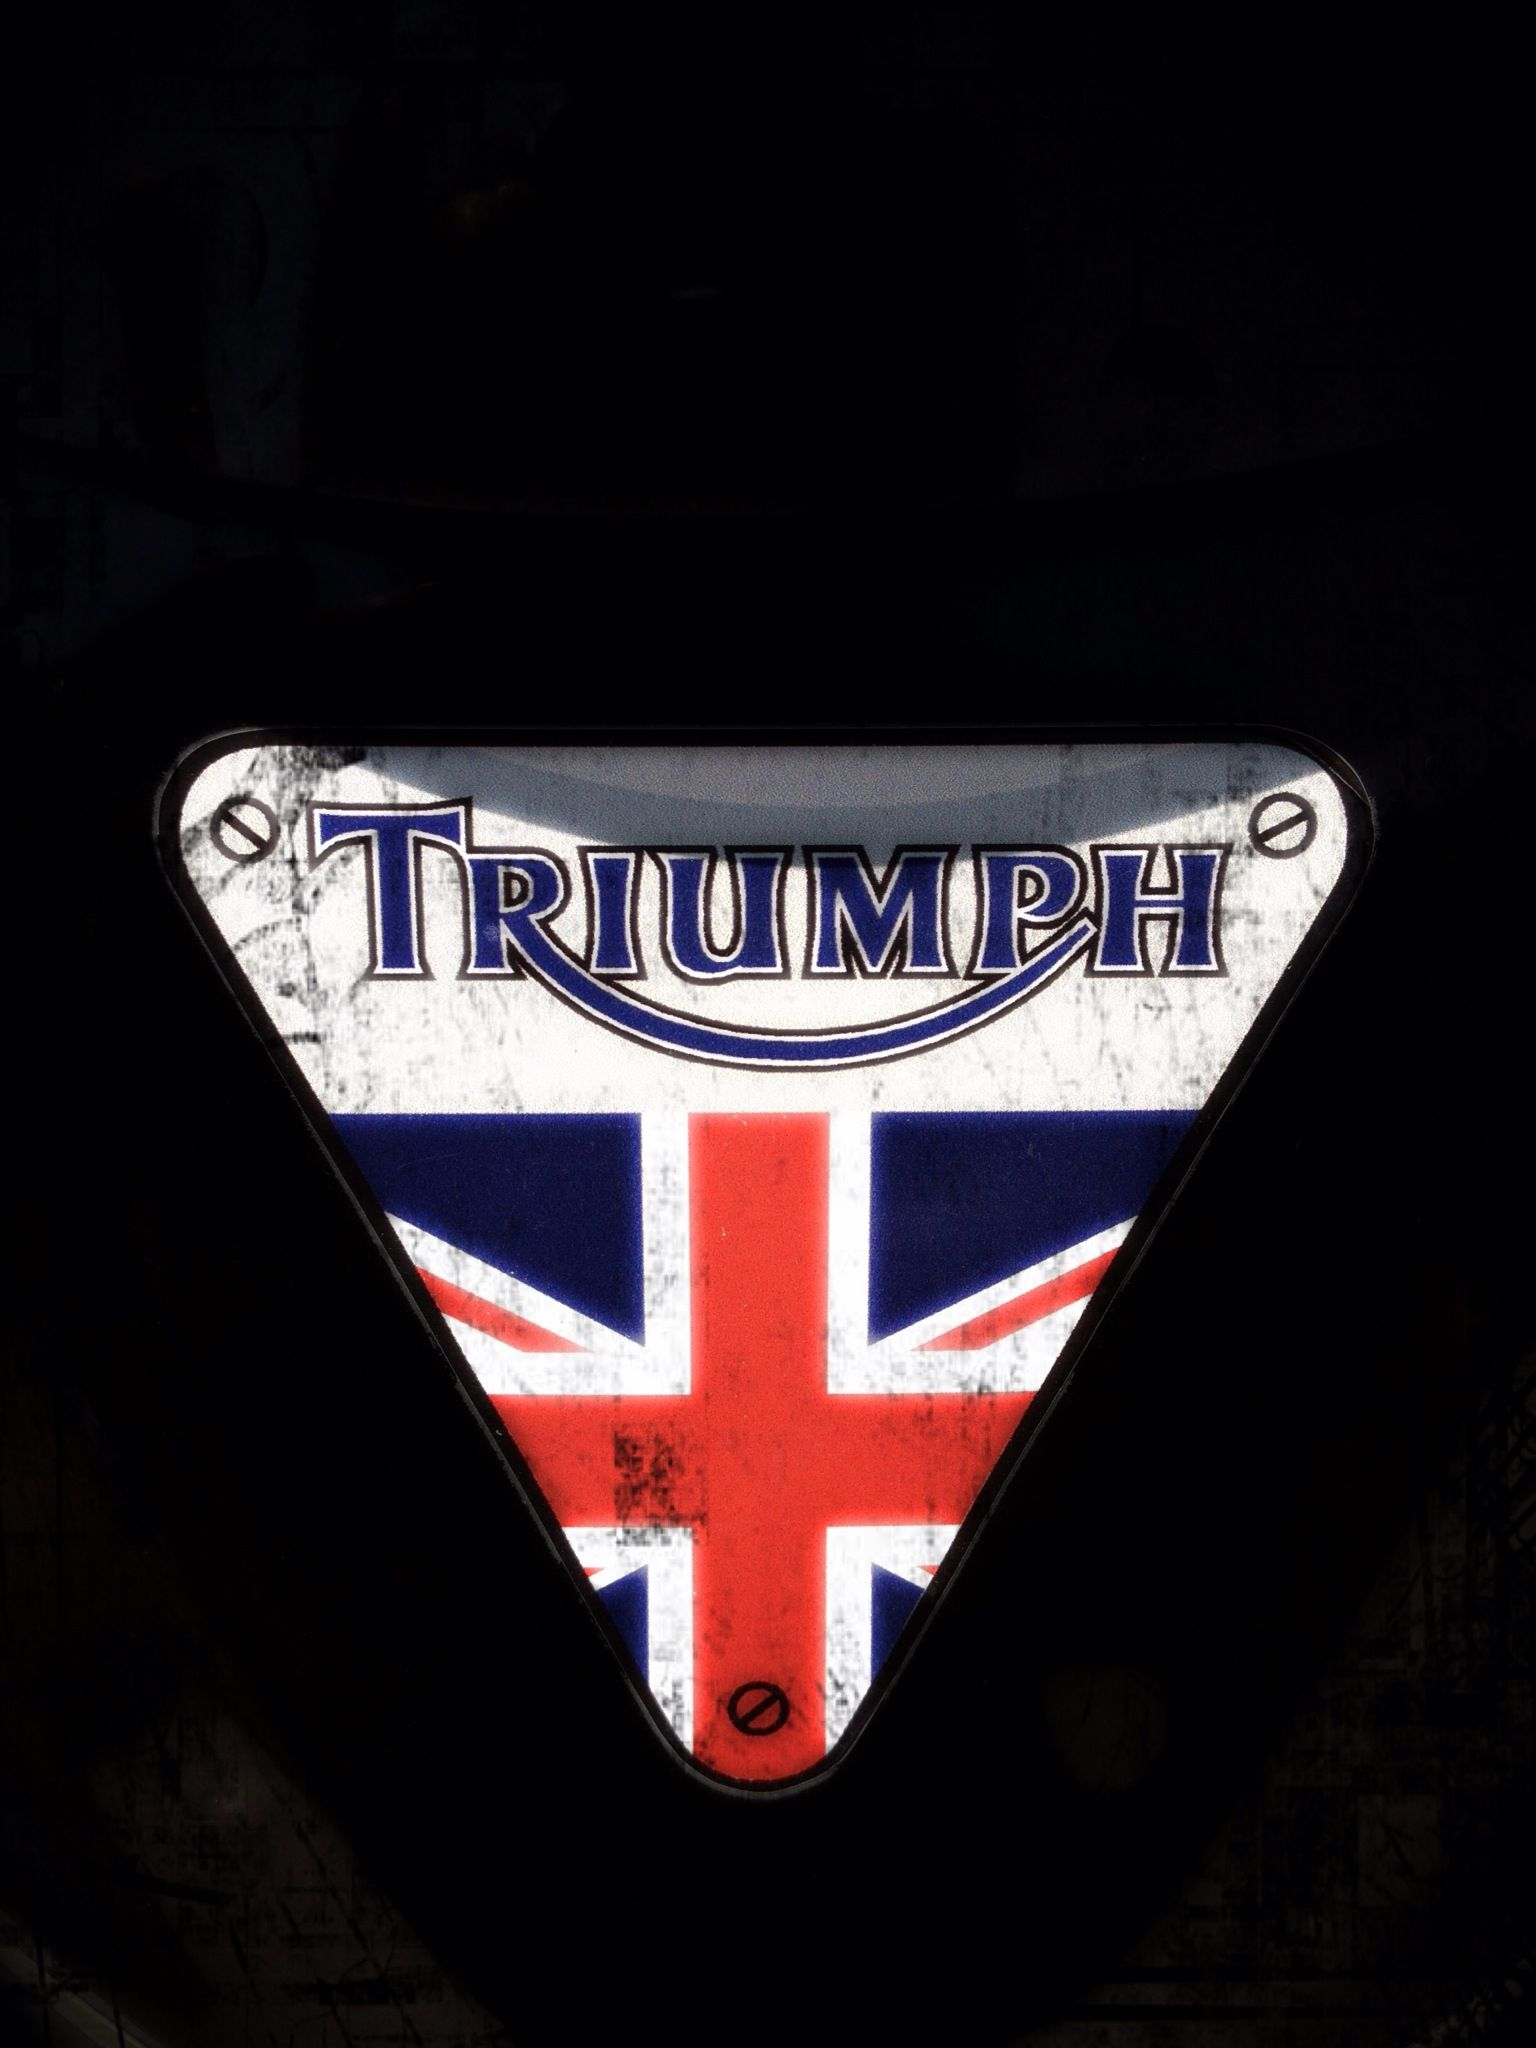 Triumph logo | Motostories | Pinterest | Logos, Triumph ...